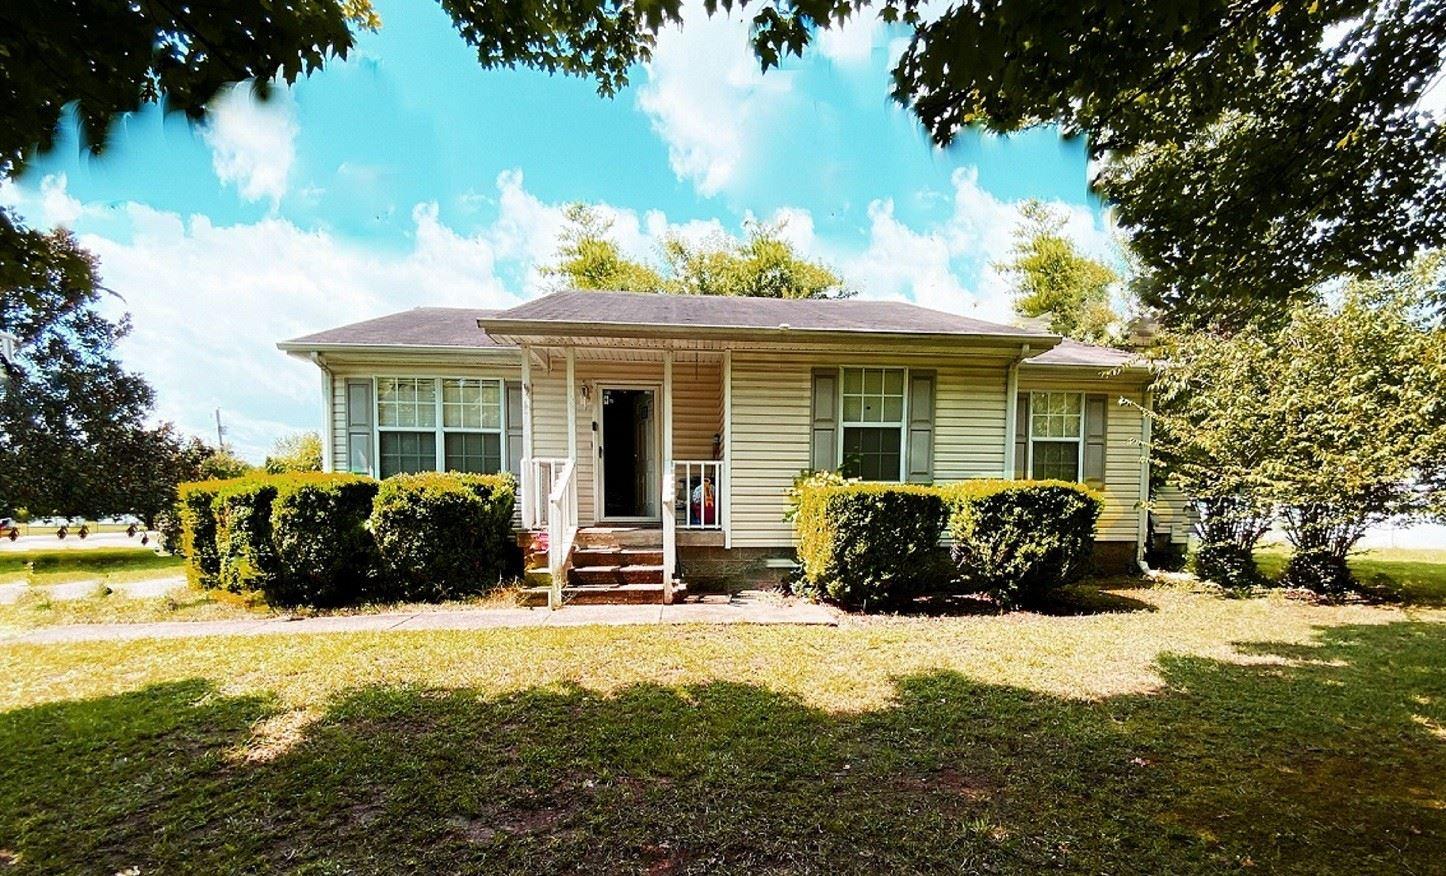 7009 Pulley Dr, Murfreesboro, TN 37129 - MLS#: 2201162